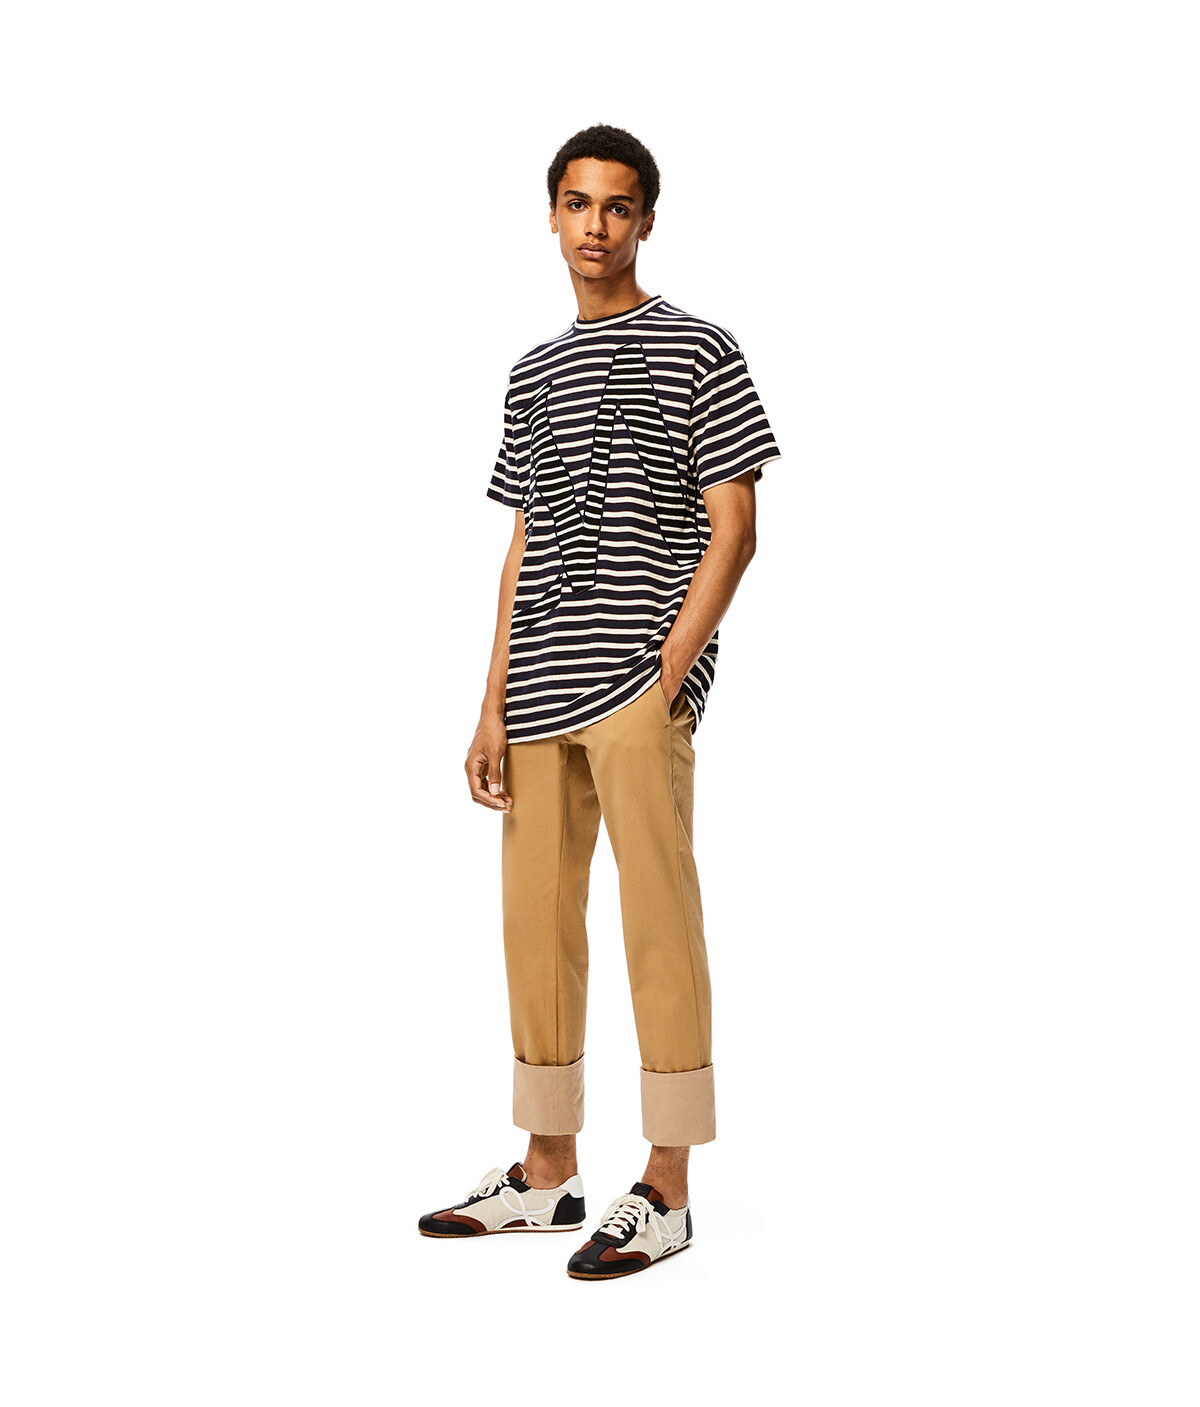 LOEWE Loewe Stripe T-Shirt Azul/Rojo/Blanco front